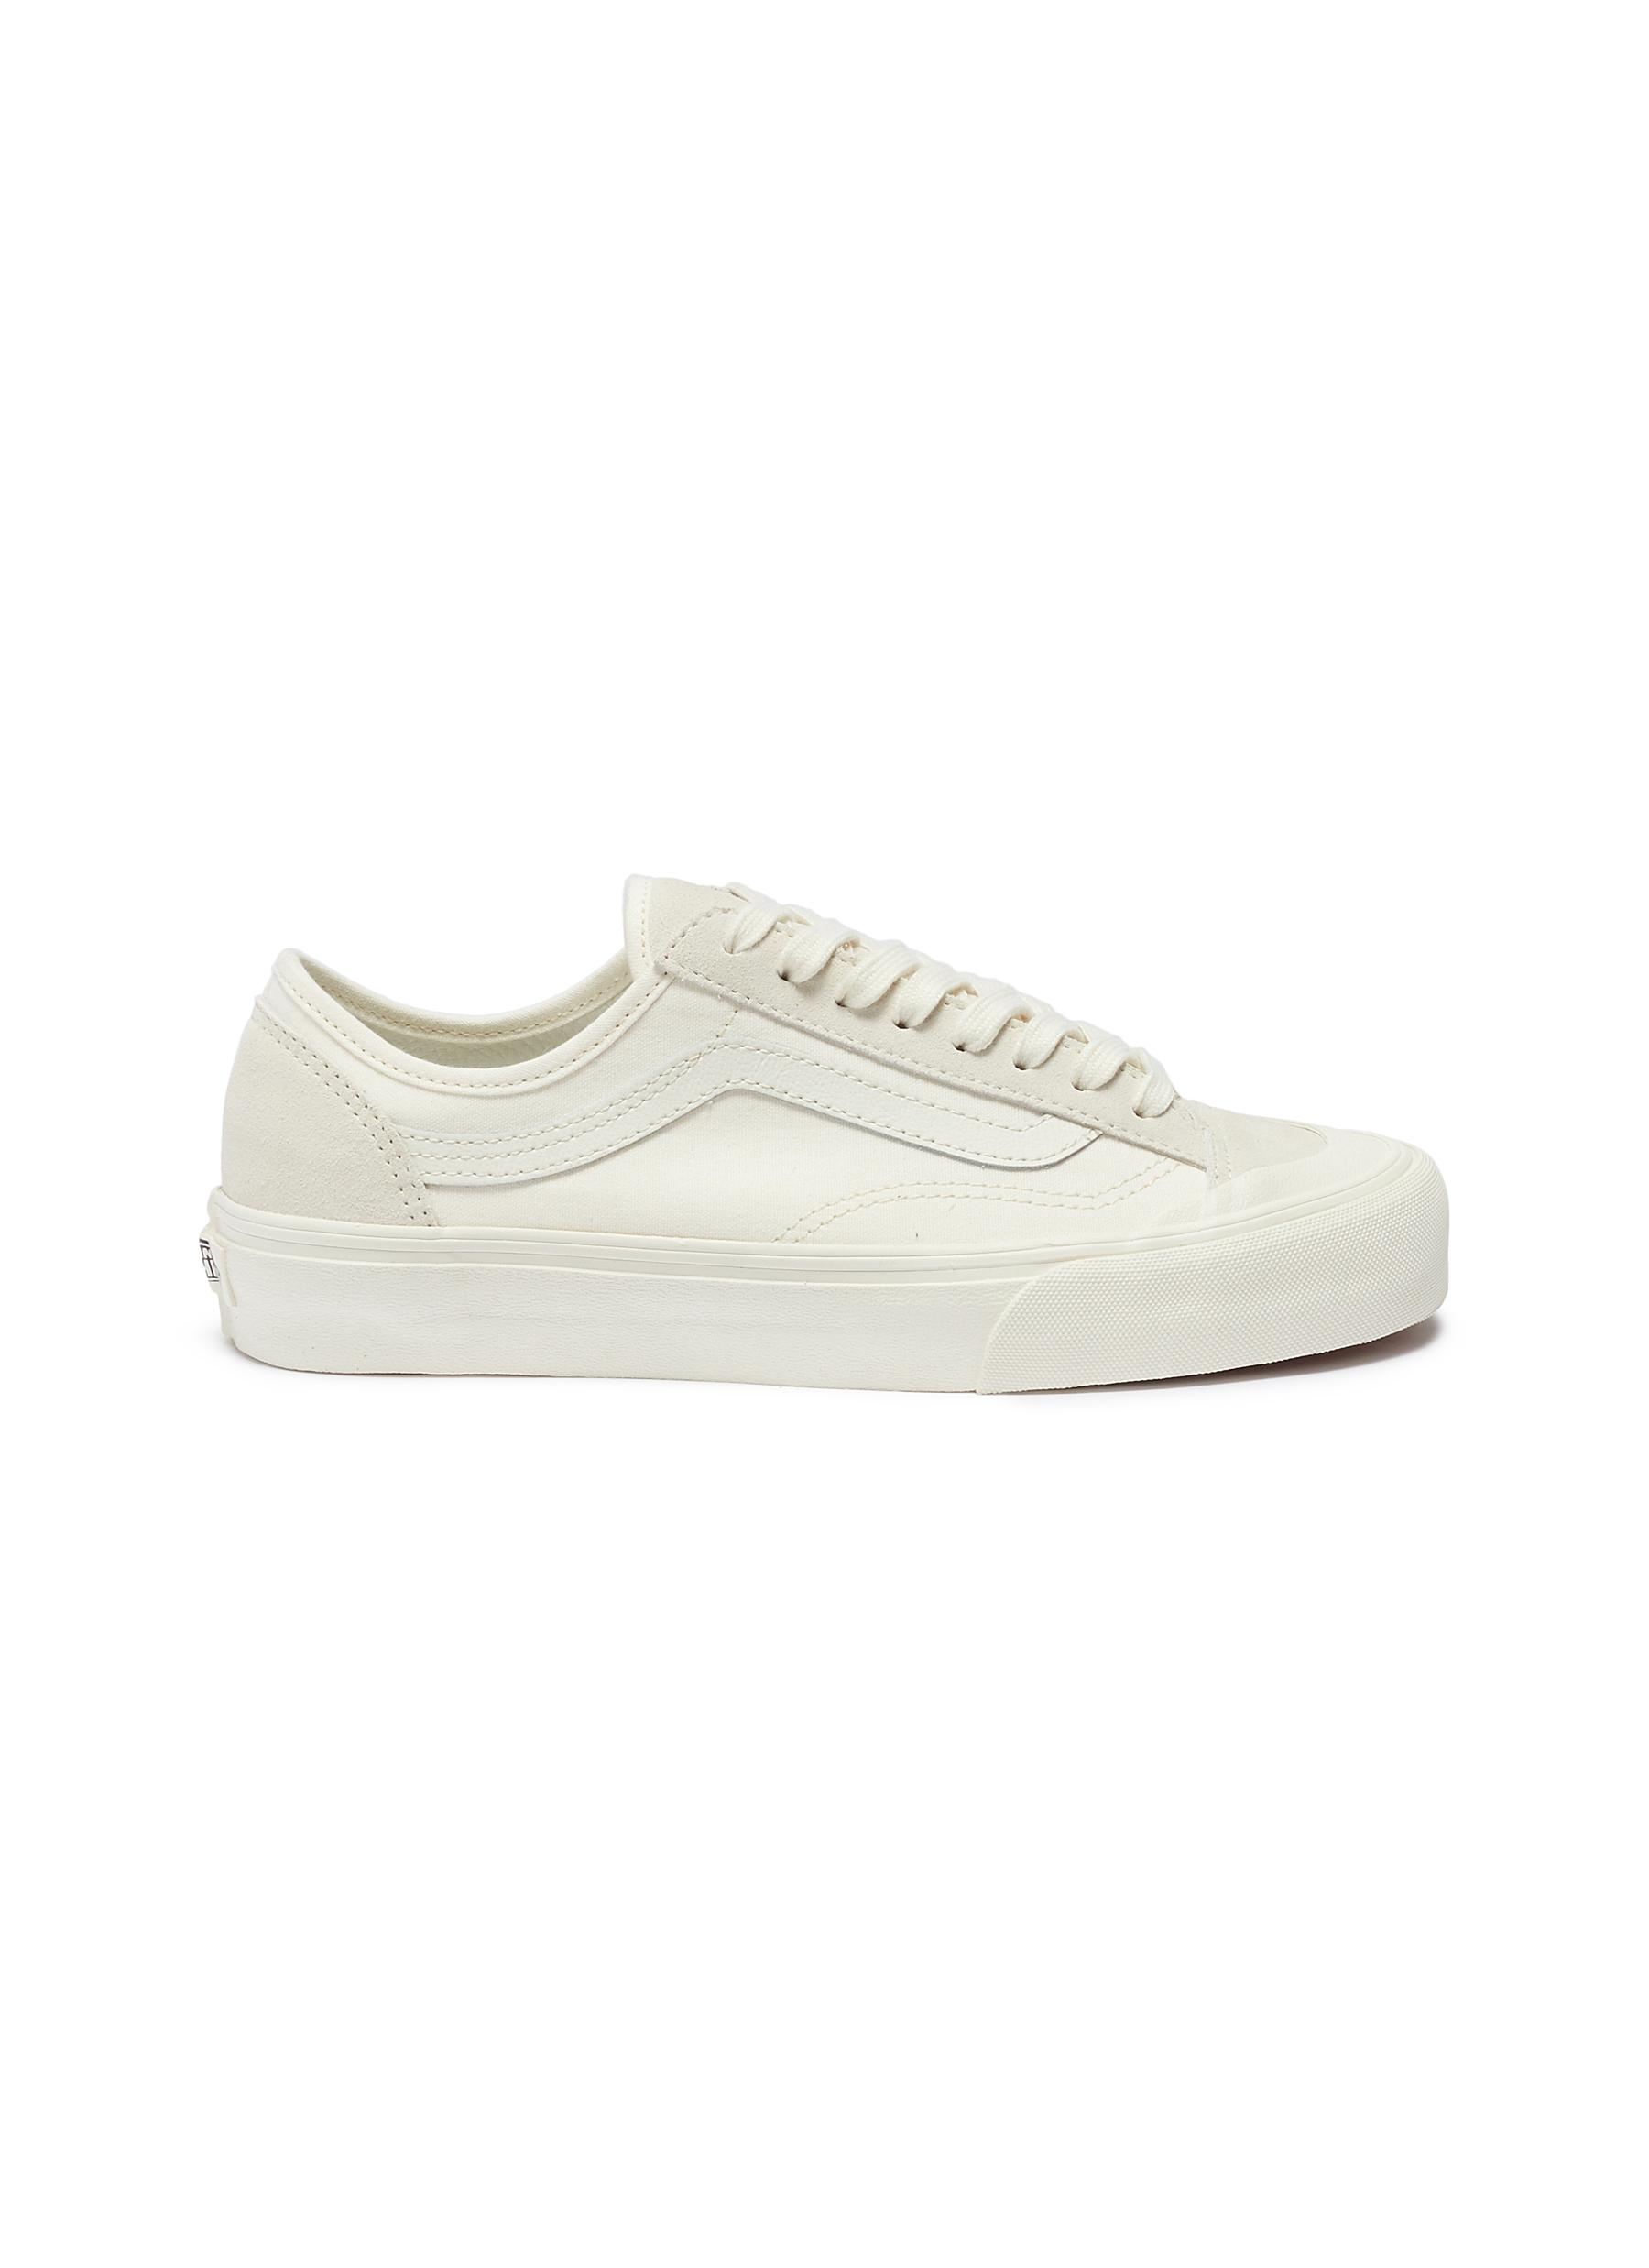 Vans Style 36 Decon Canvas Sneakers Women Lane Crawford